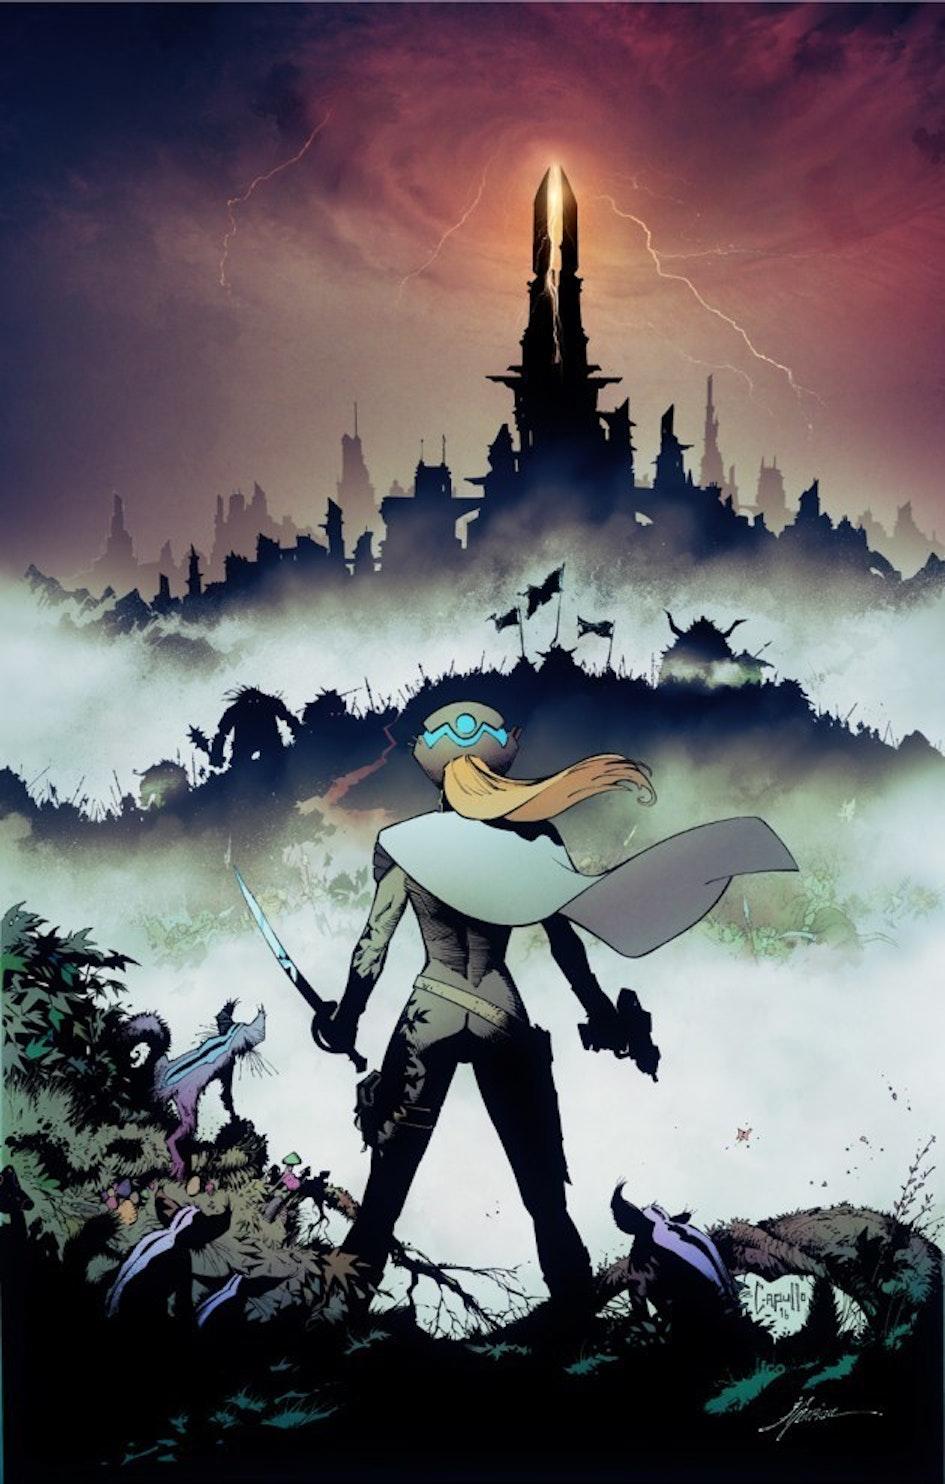 Reborn #1 cover by Greg Capullo